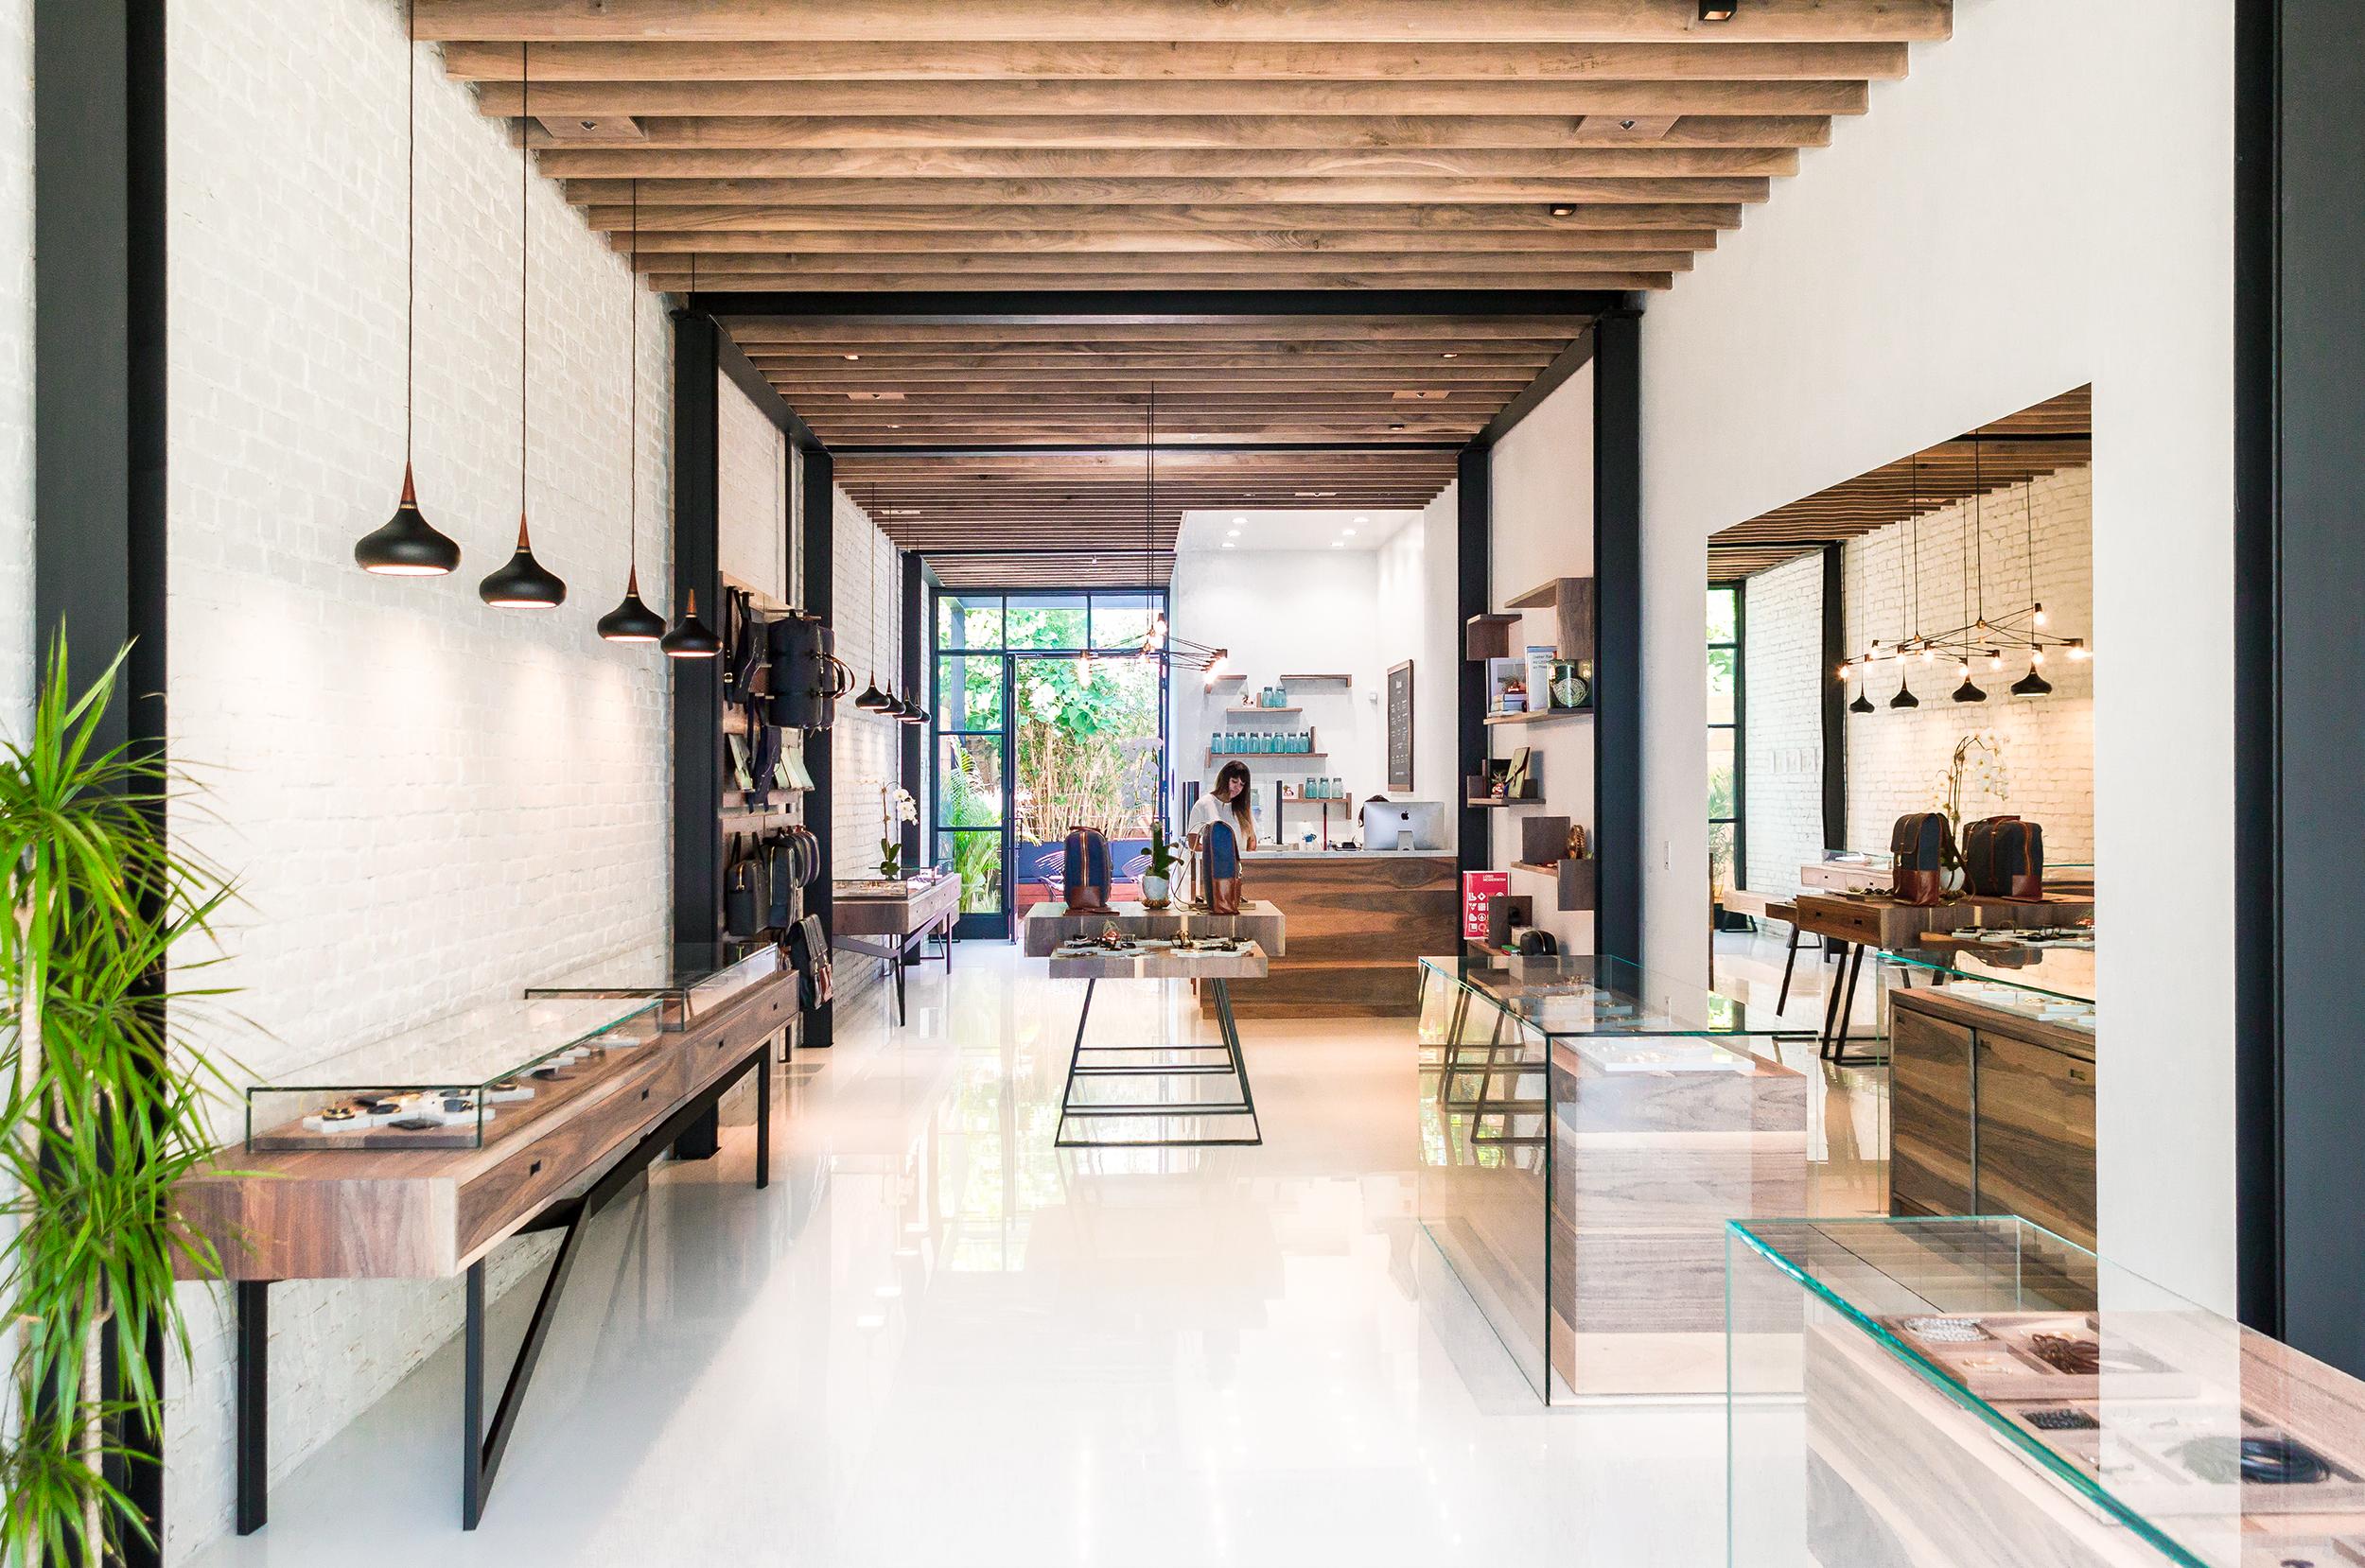 miansai-interior-store-designer.jpg